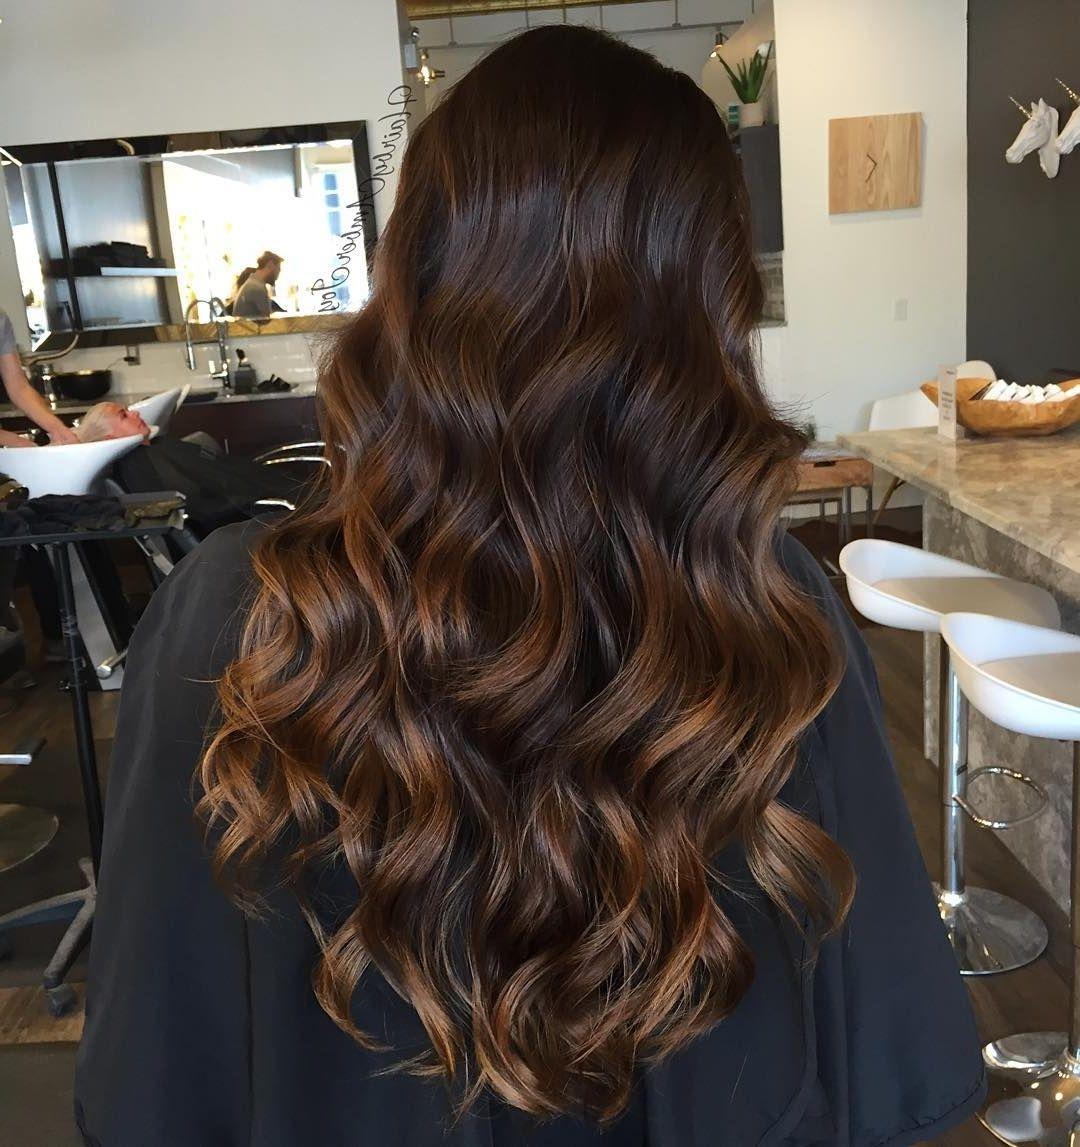 Caramel Highlights On Black Hairs 60 Balayage Hair Color Ideas With